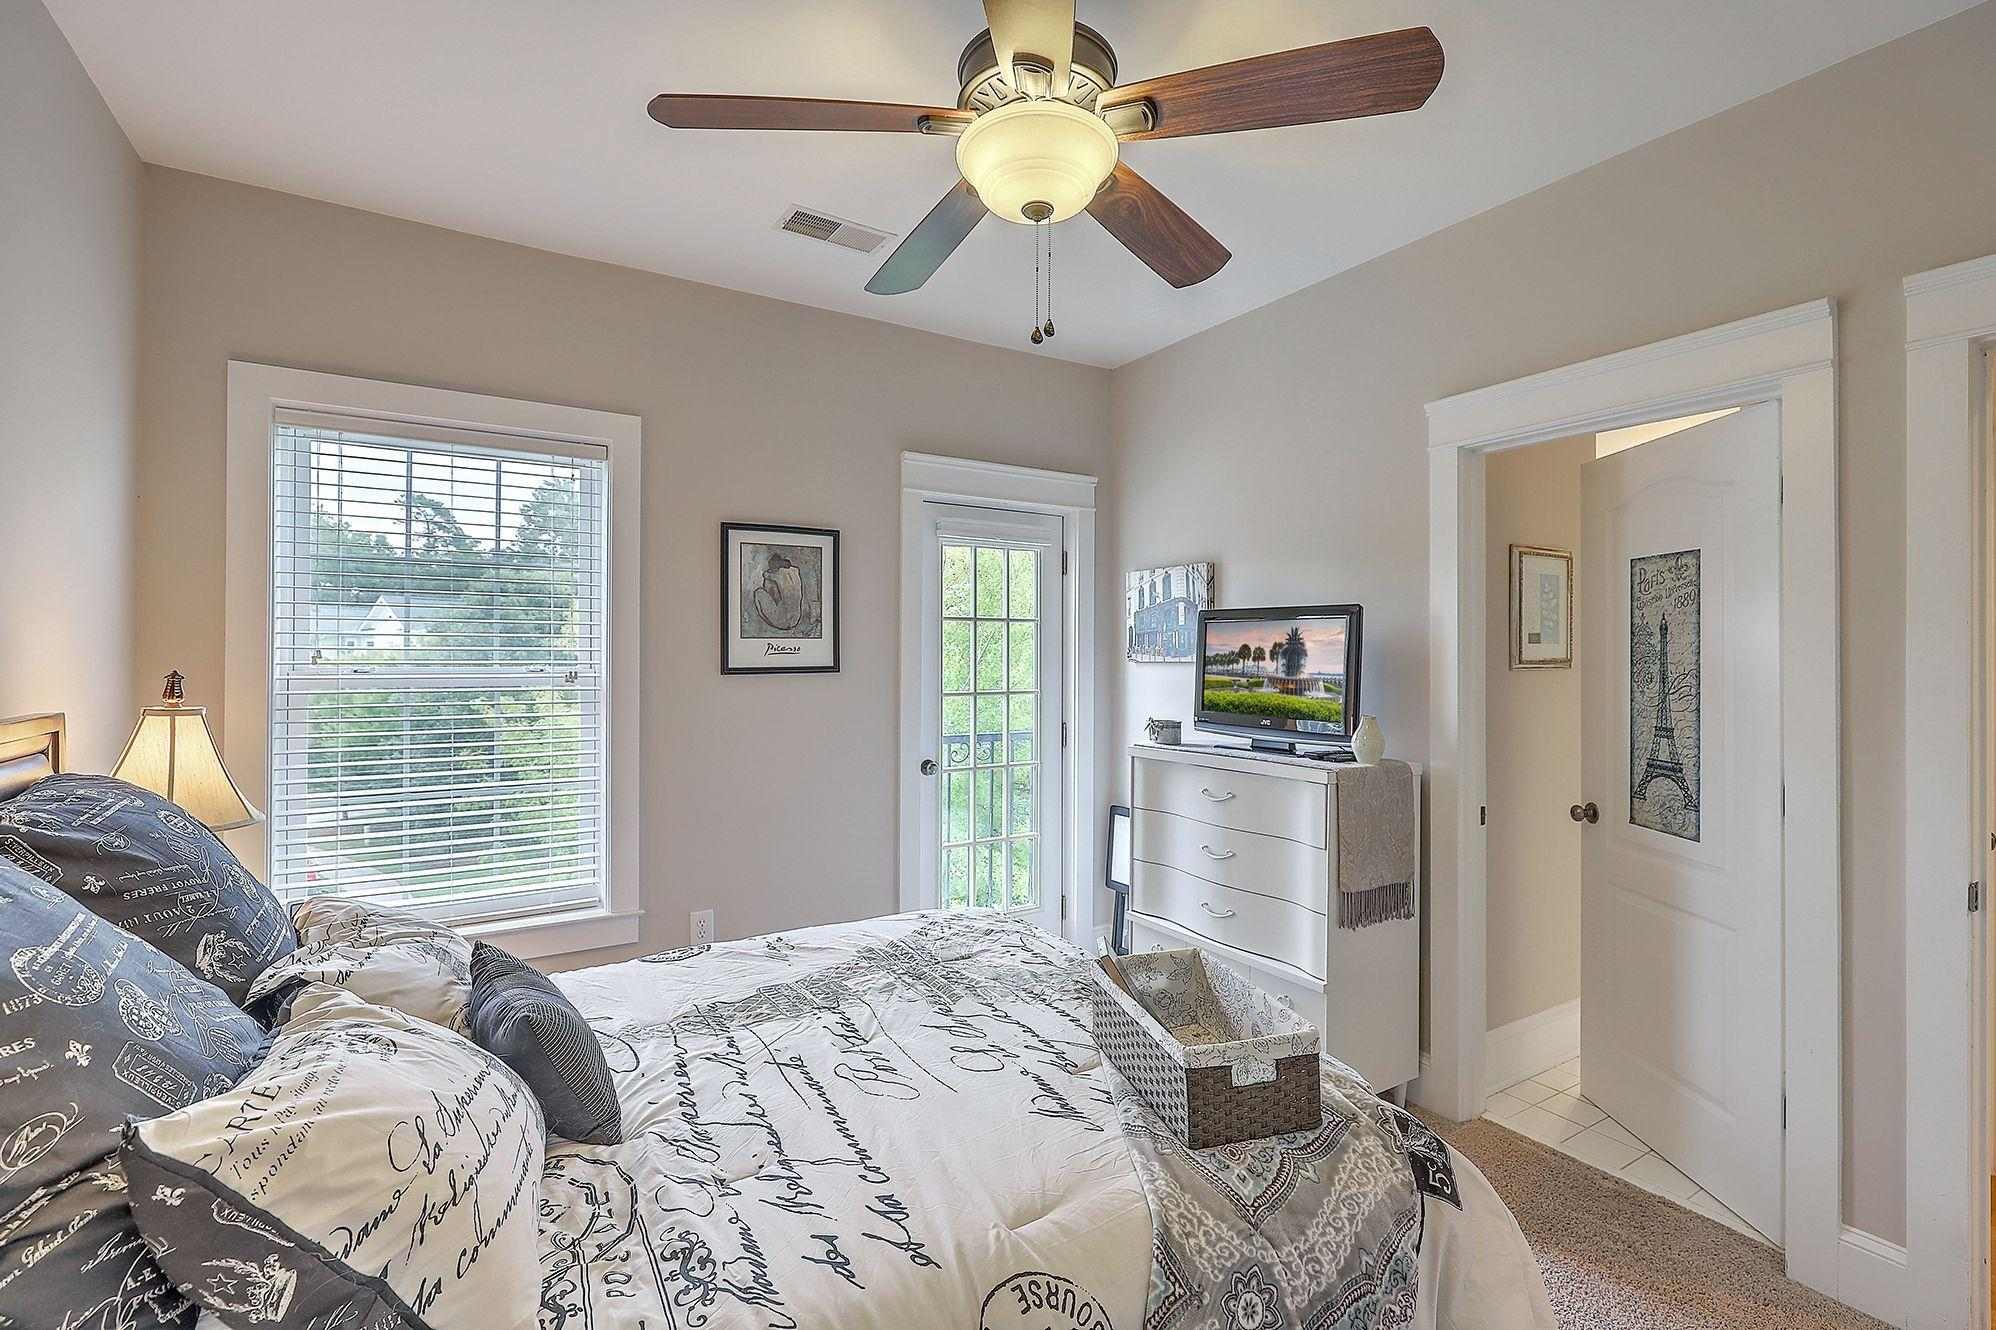 Etiwan Pointe Homes For Sale - 208 Etiwan Pointe, Mount Pleasant, SC - 21